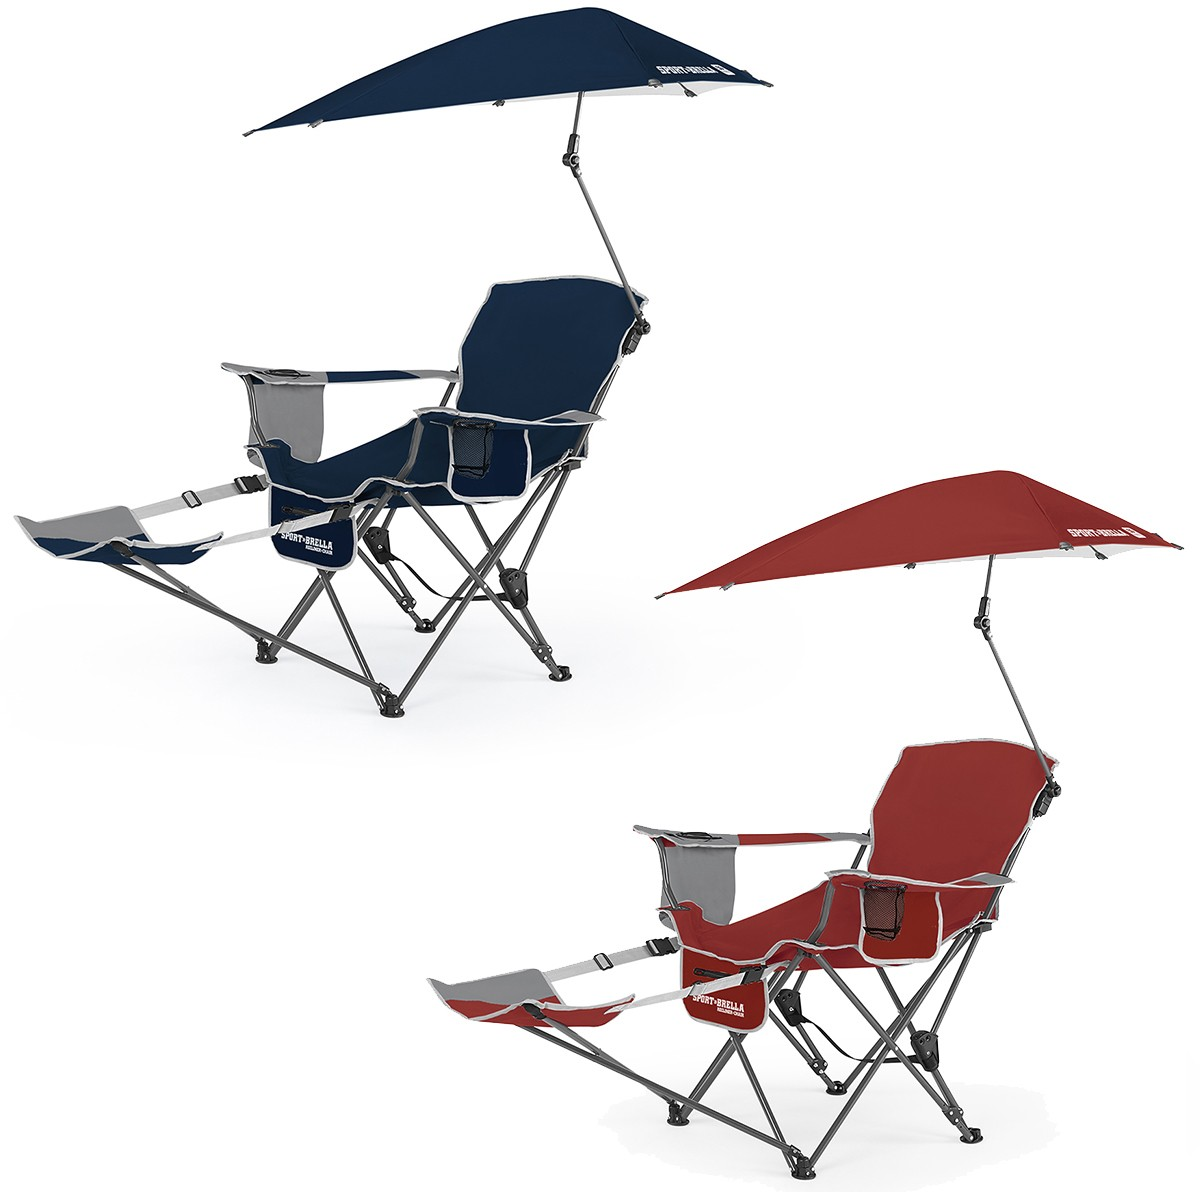 Sklz Sport Brella Recliner Folding Chair W Umbrella Footrest